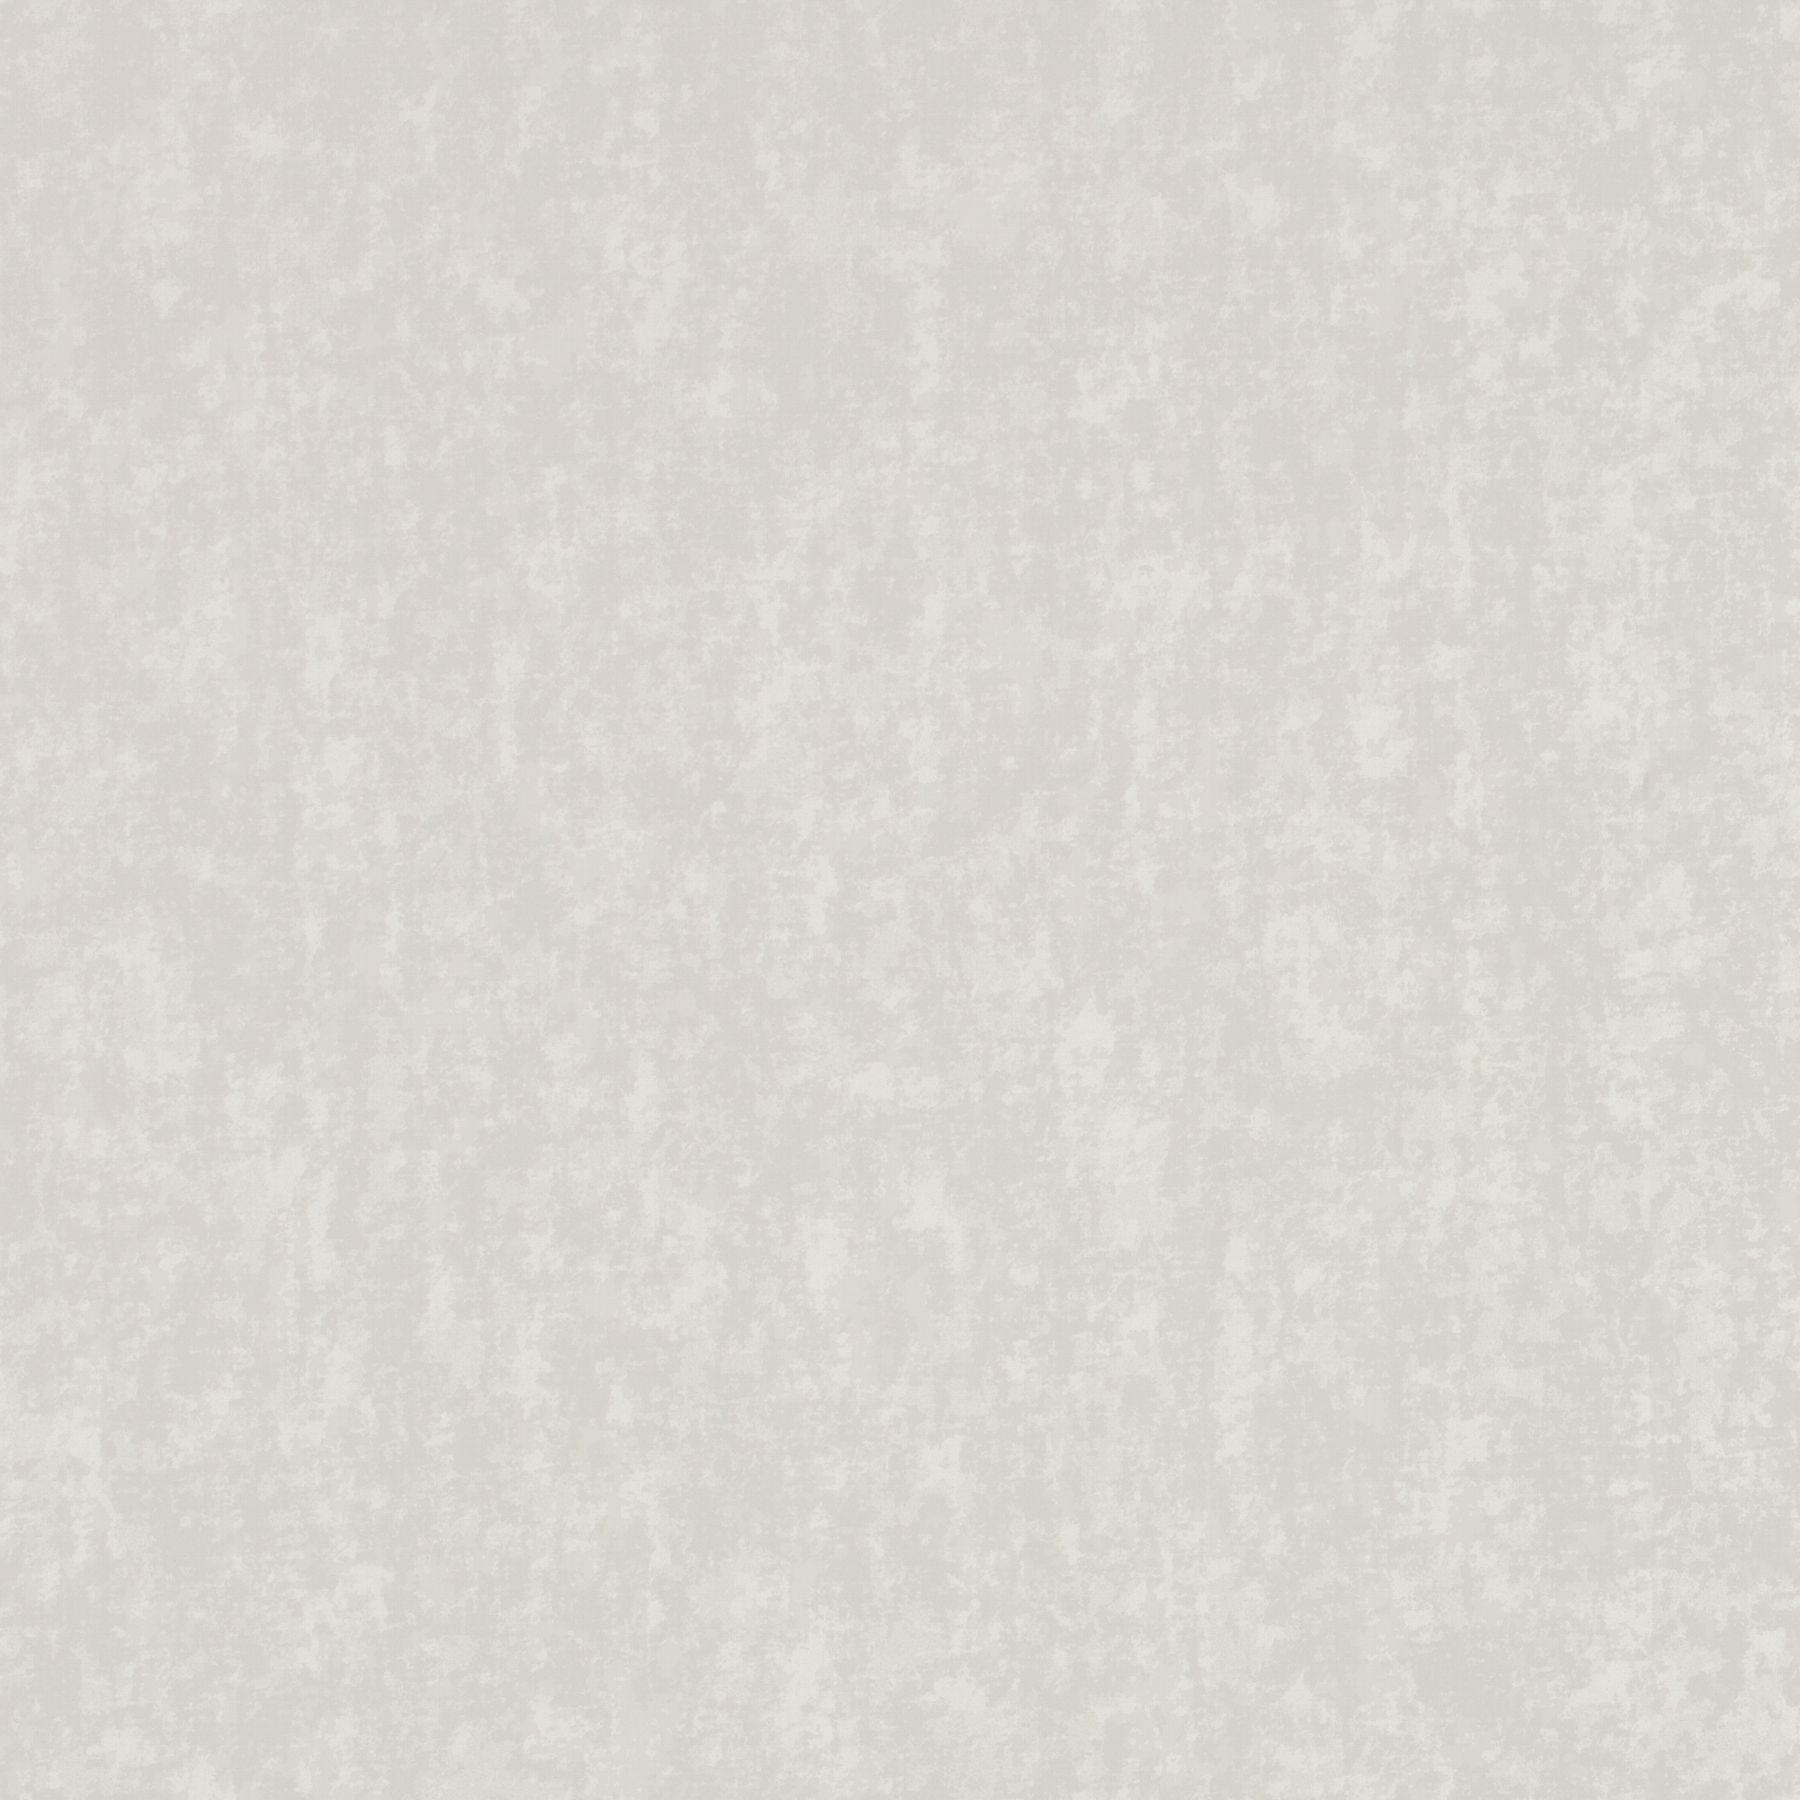 wallpapers absinth 4 4052 090 jab anstoetz fabrics. Black Bedroom Furniture Sets. Home Design Ideas